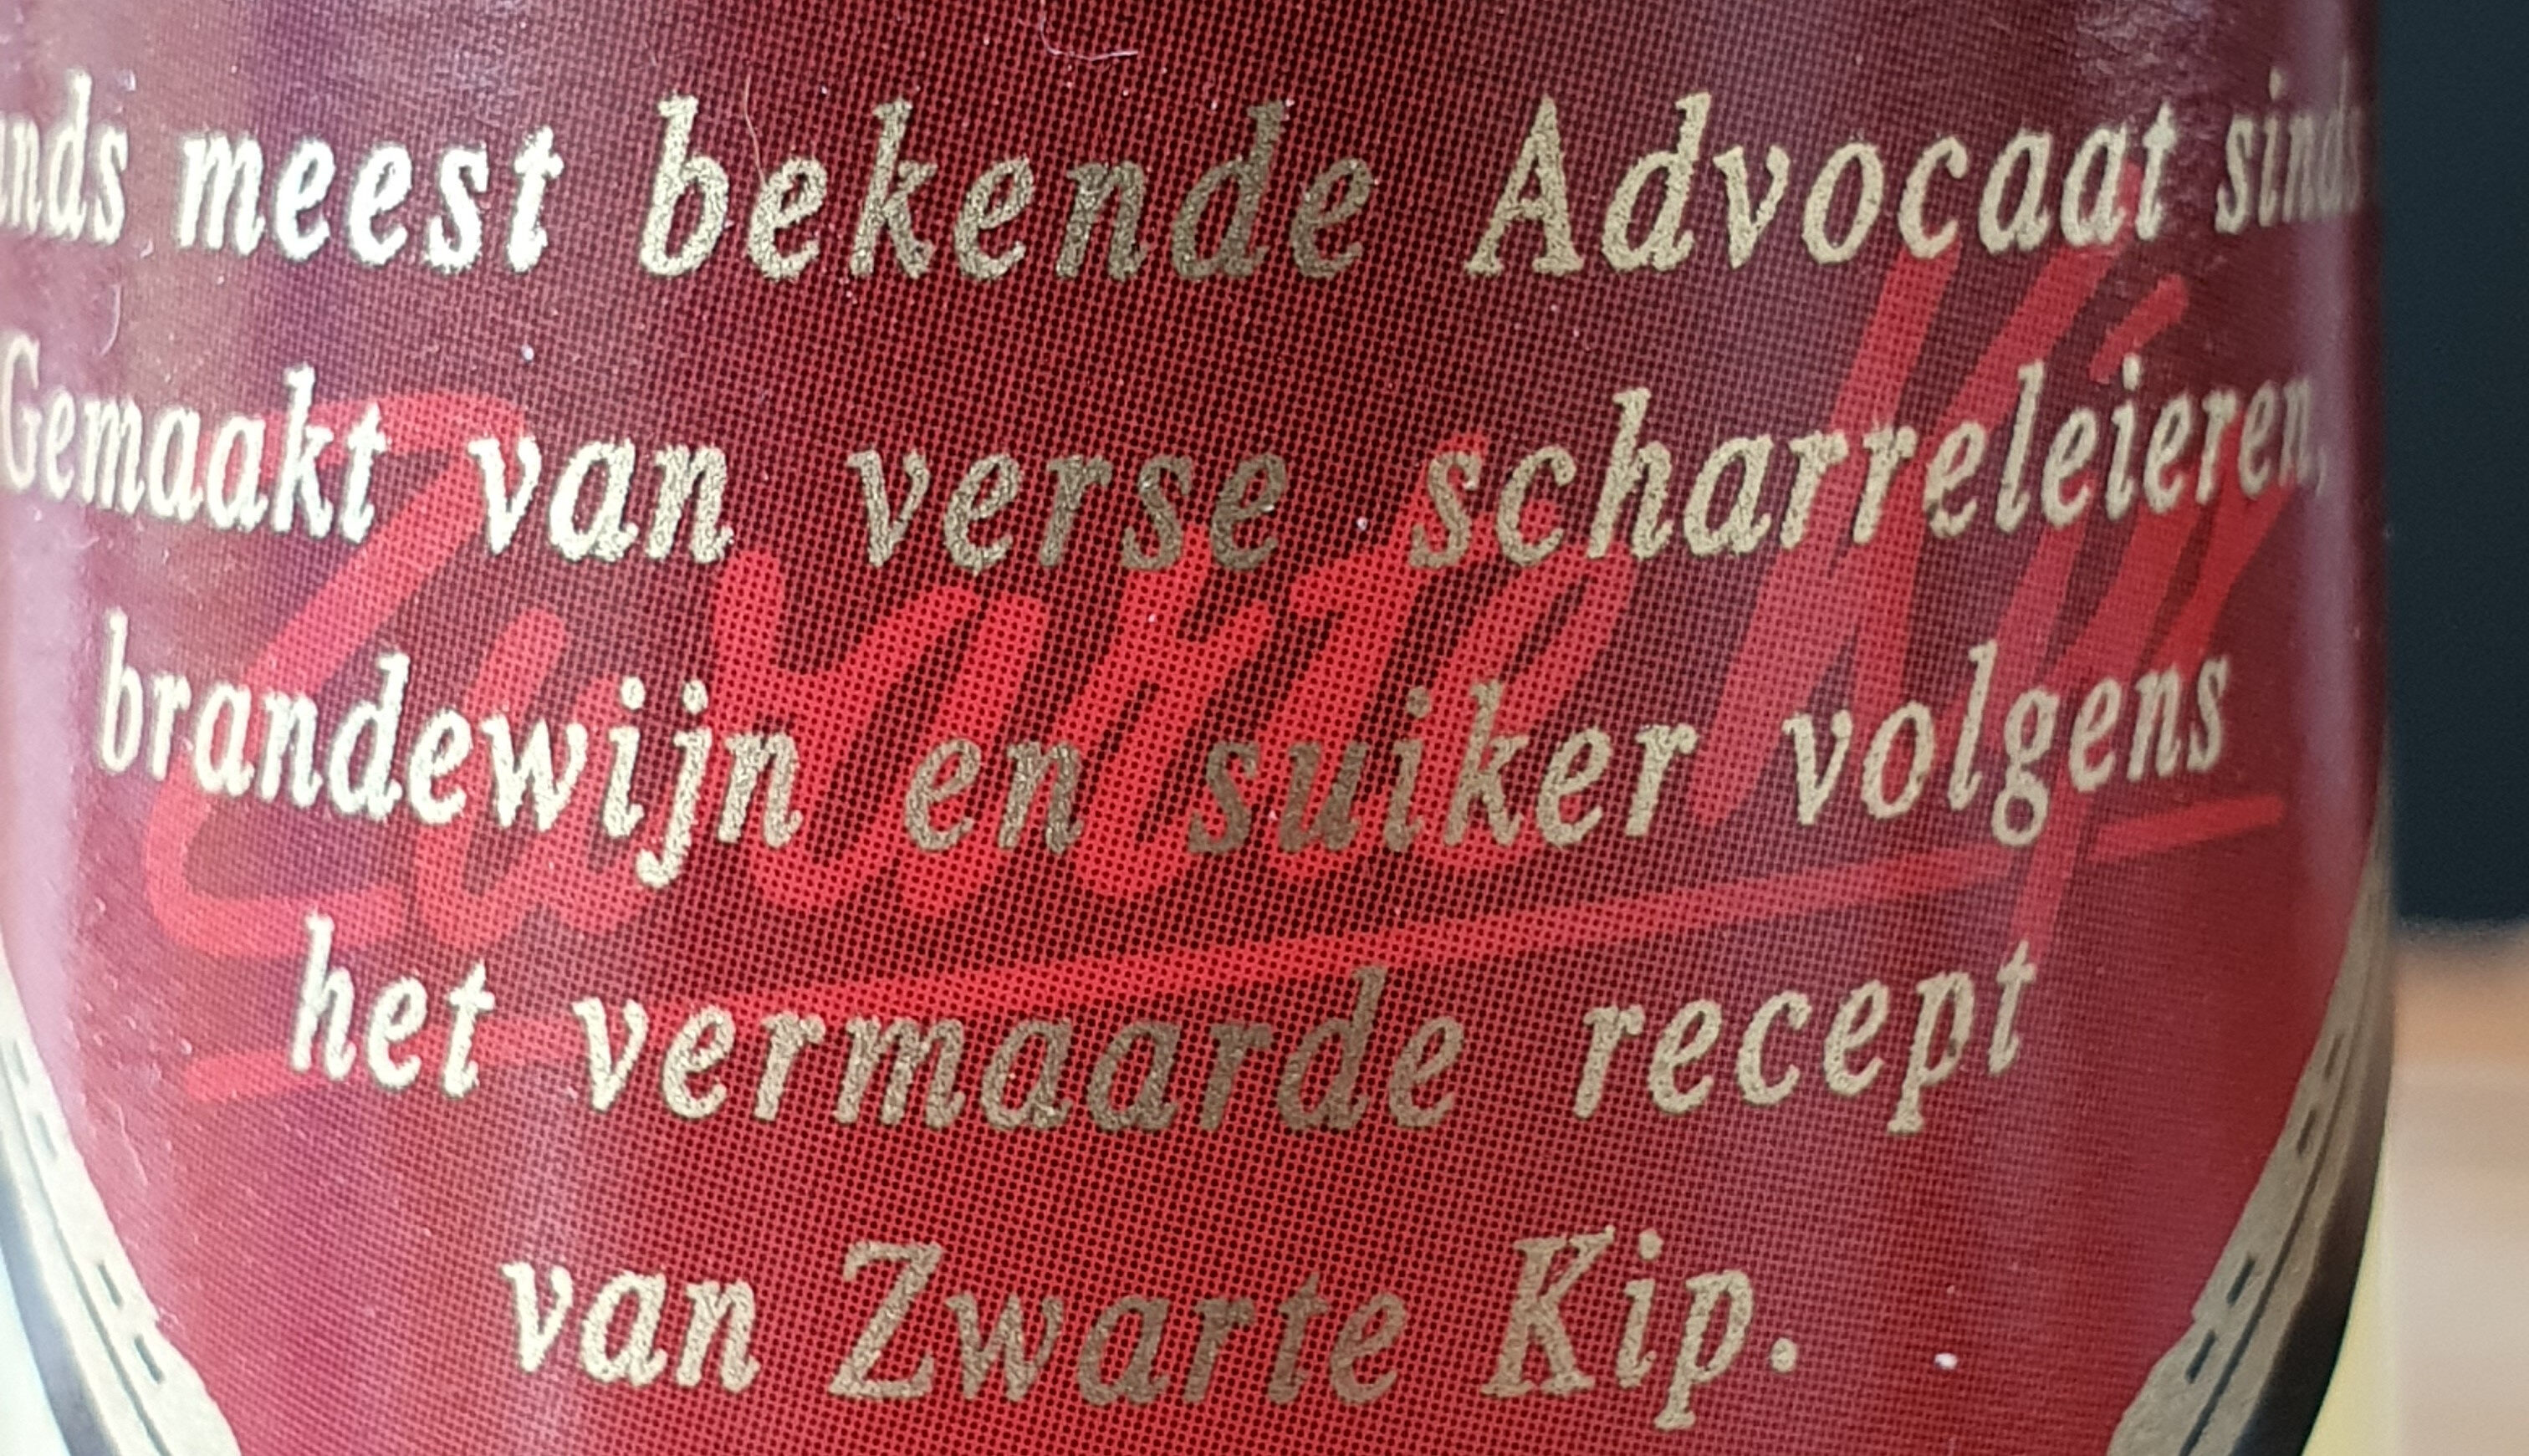 Zwarte kip advocaat - Ingrédients - nl